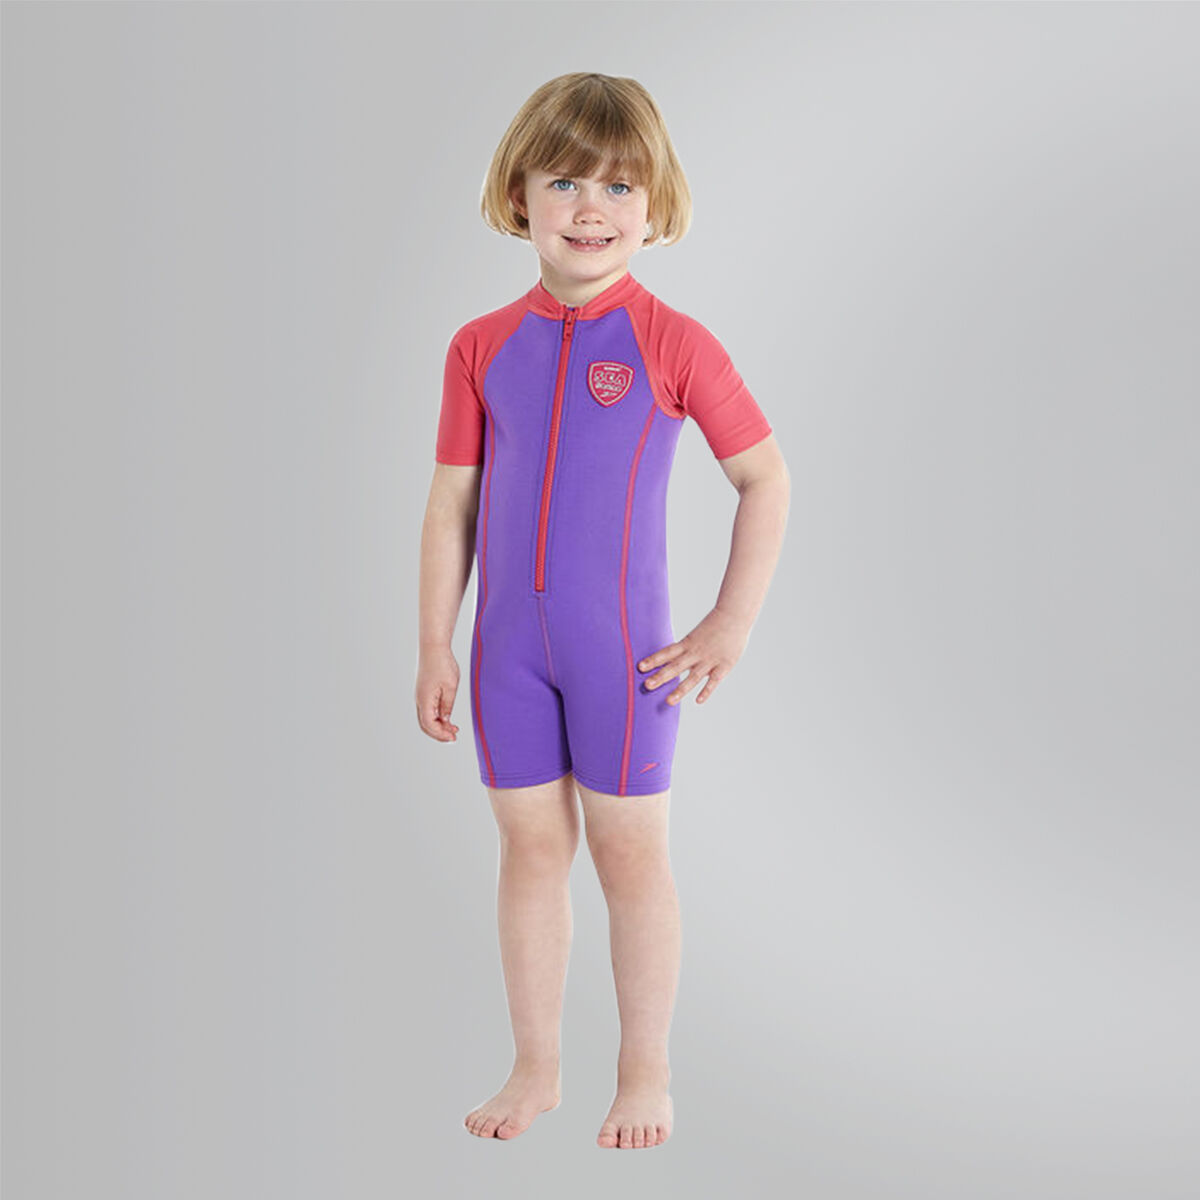 Baby Seasquad Hot Tot Suit